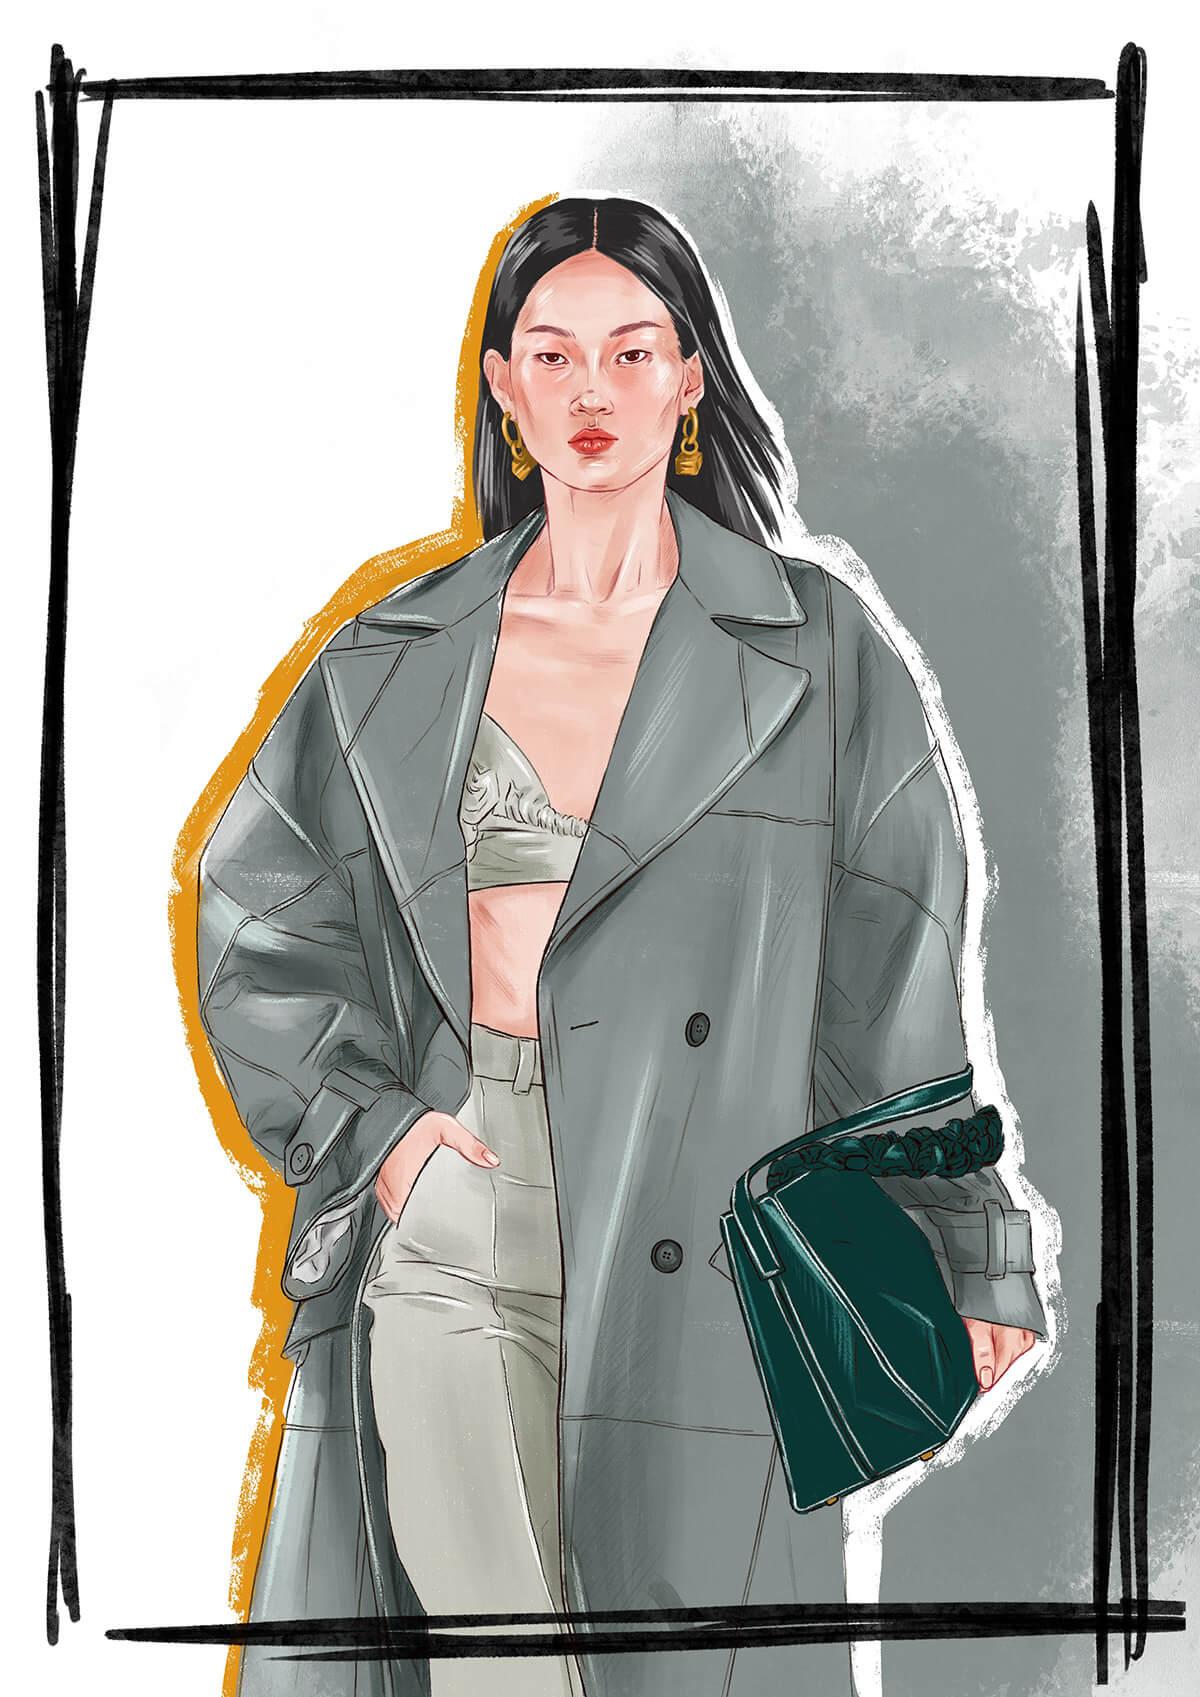 Jacquemus fashion illustration